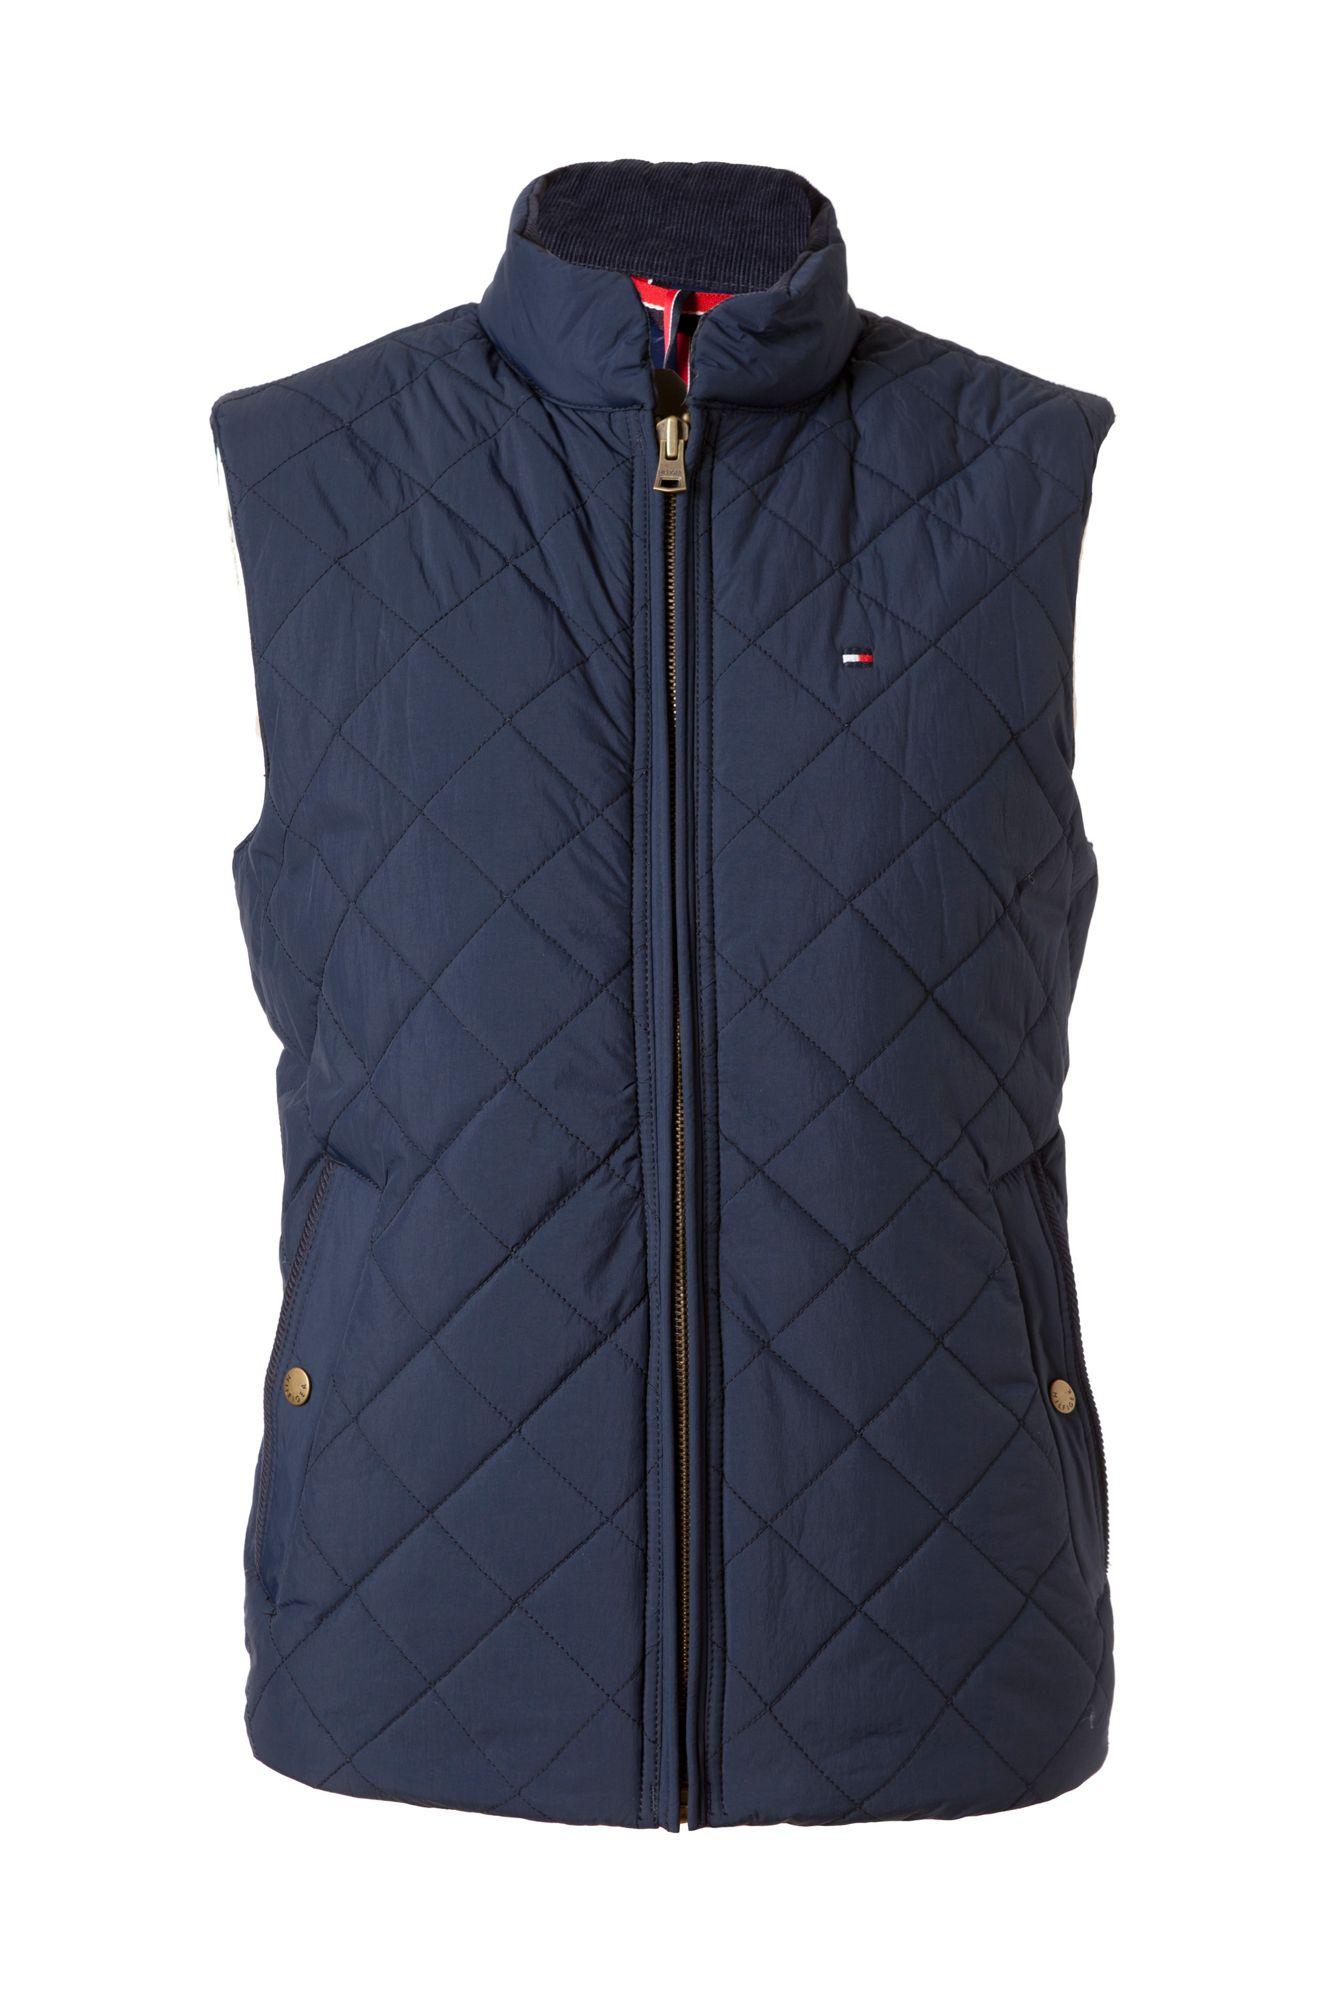 Tommy Hilfiger Quilted Browning Vest In Blue For Men Lyst